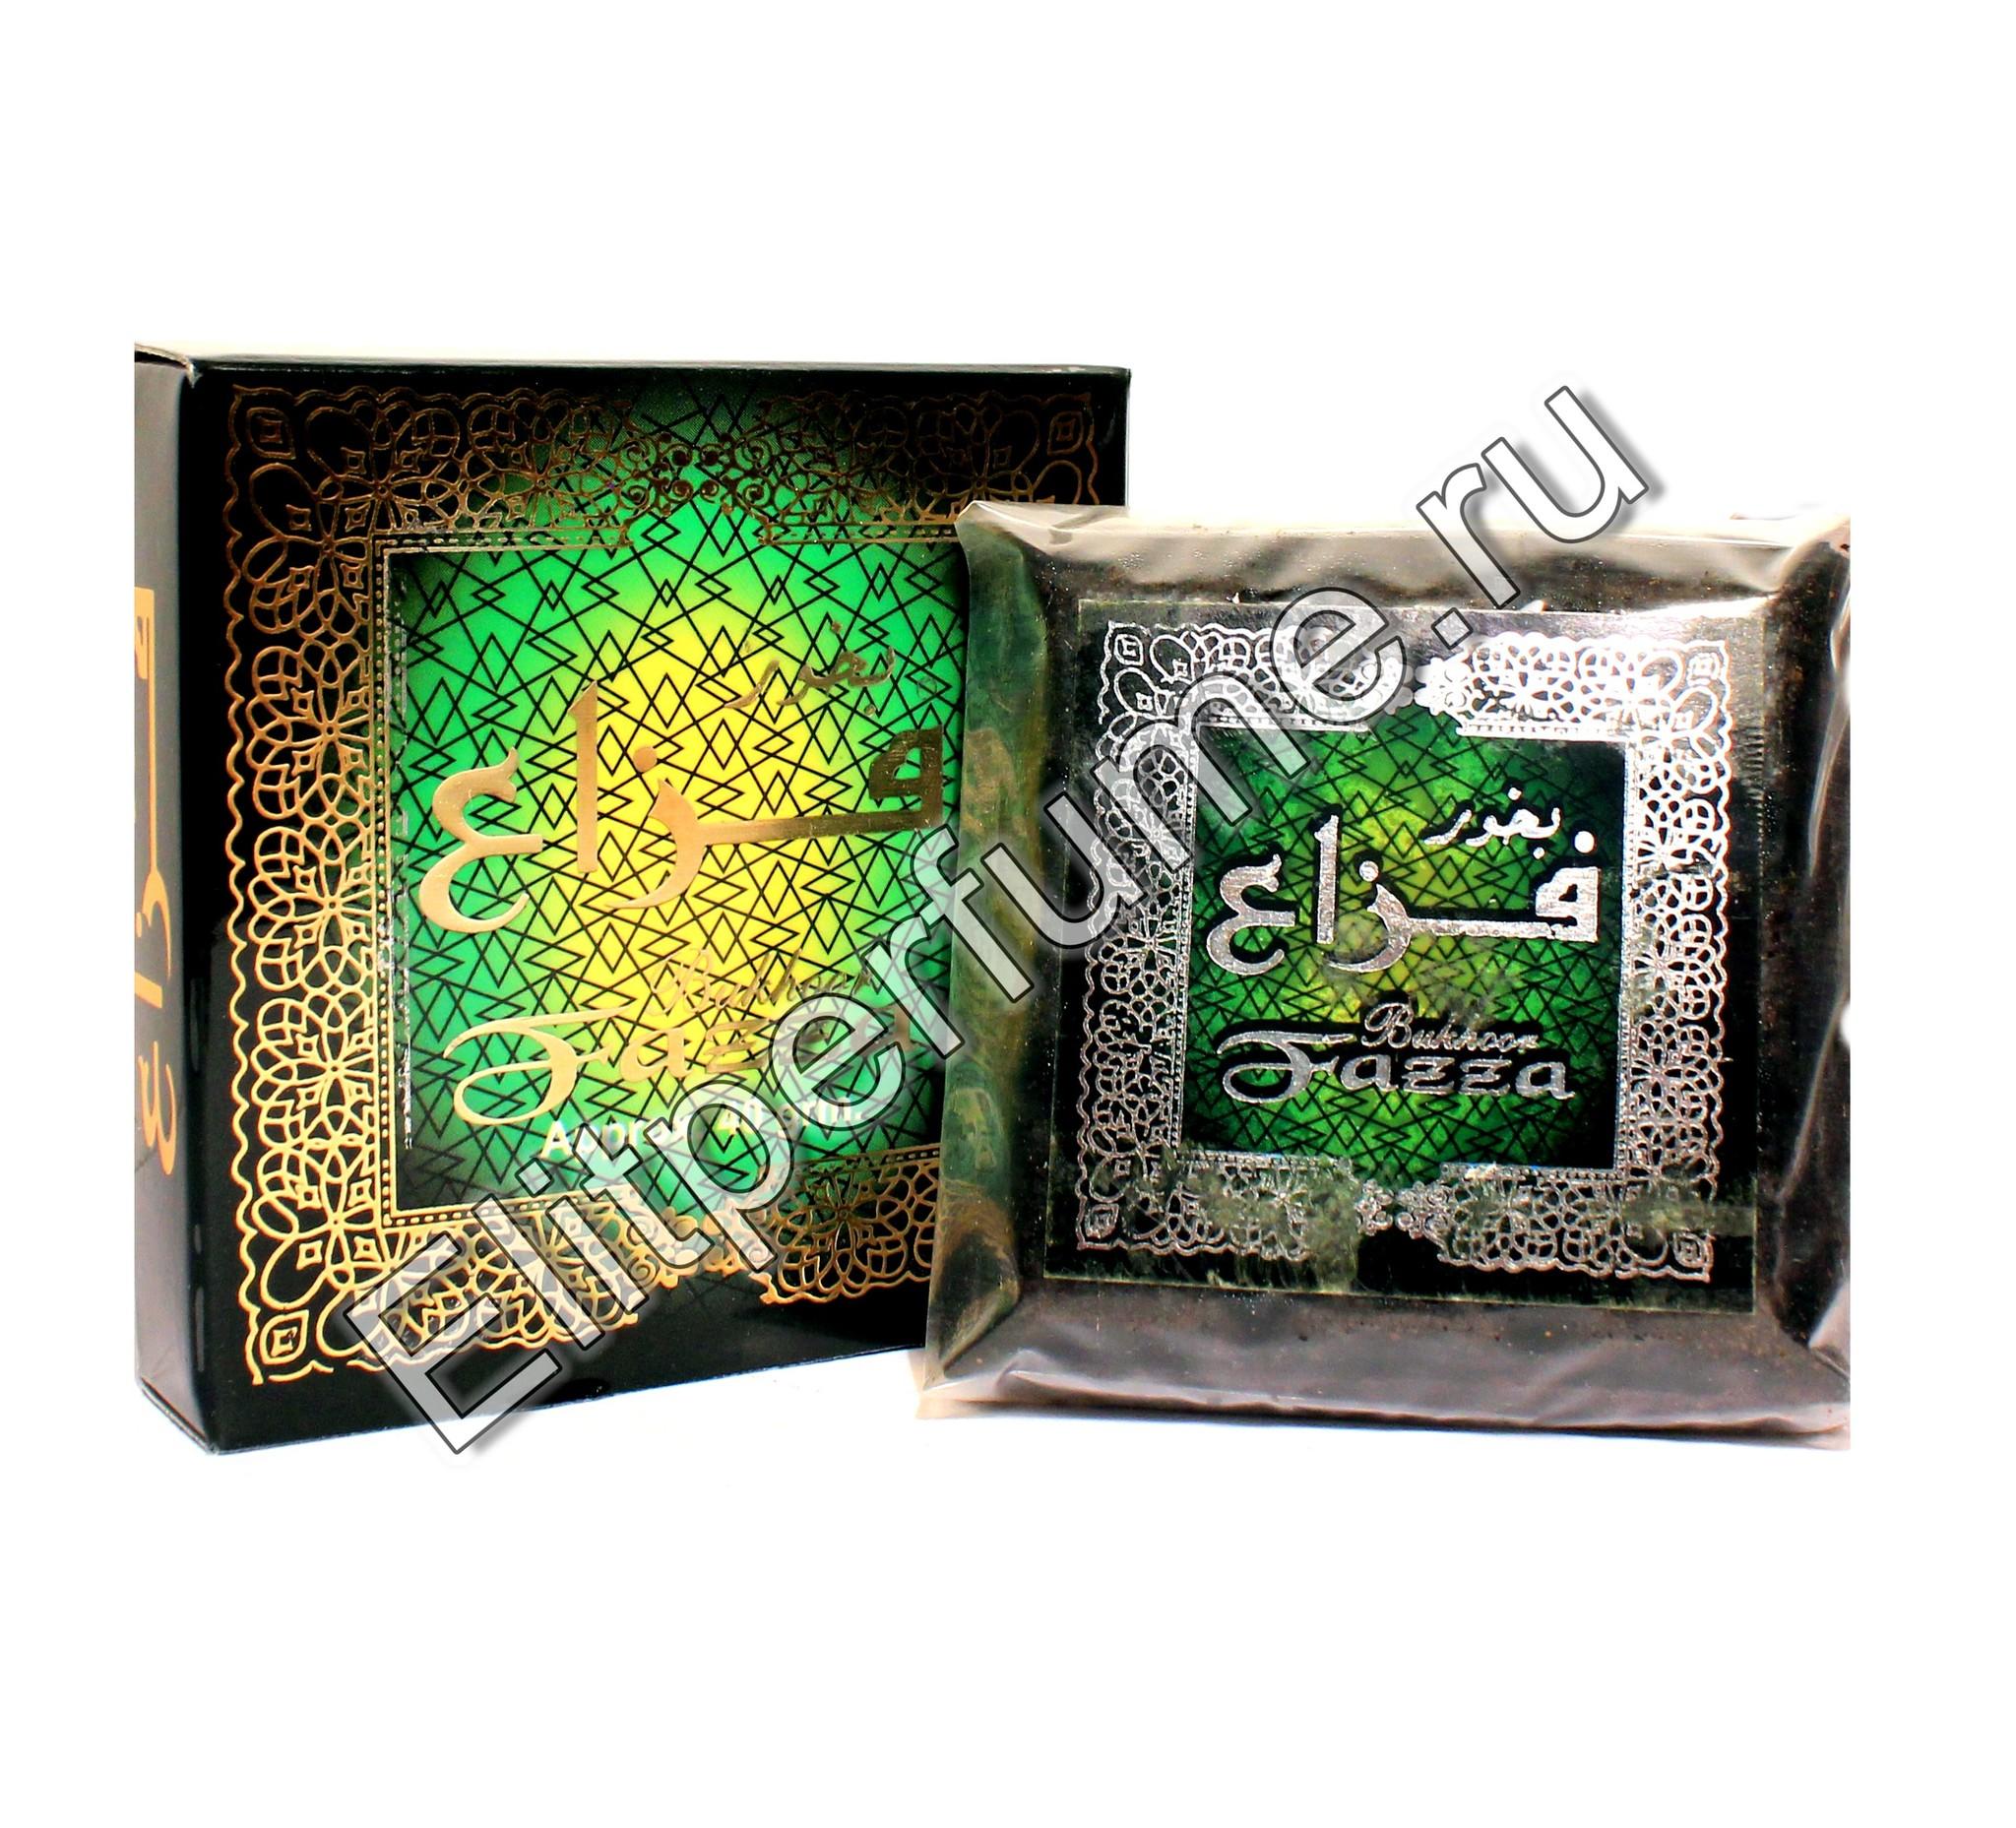 Bakhoor Fazza Бахур Фазза 40 гр. аромосмесь от Ард Аль Заафаран Ard Al Zaafaran